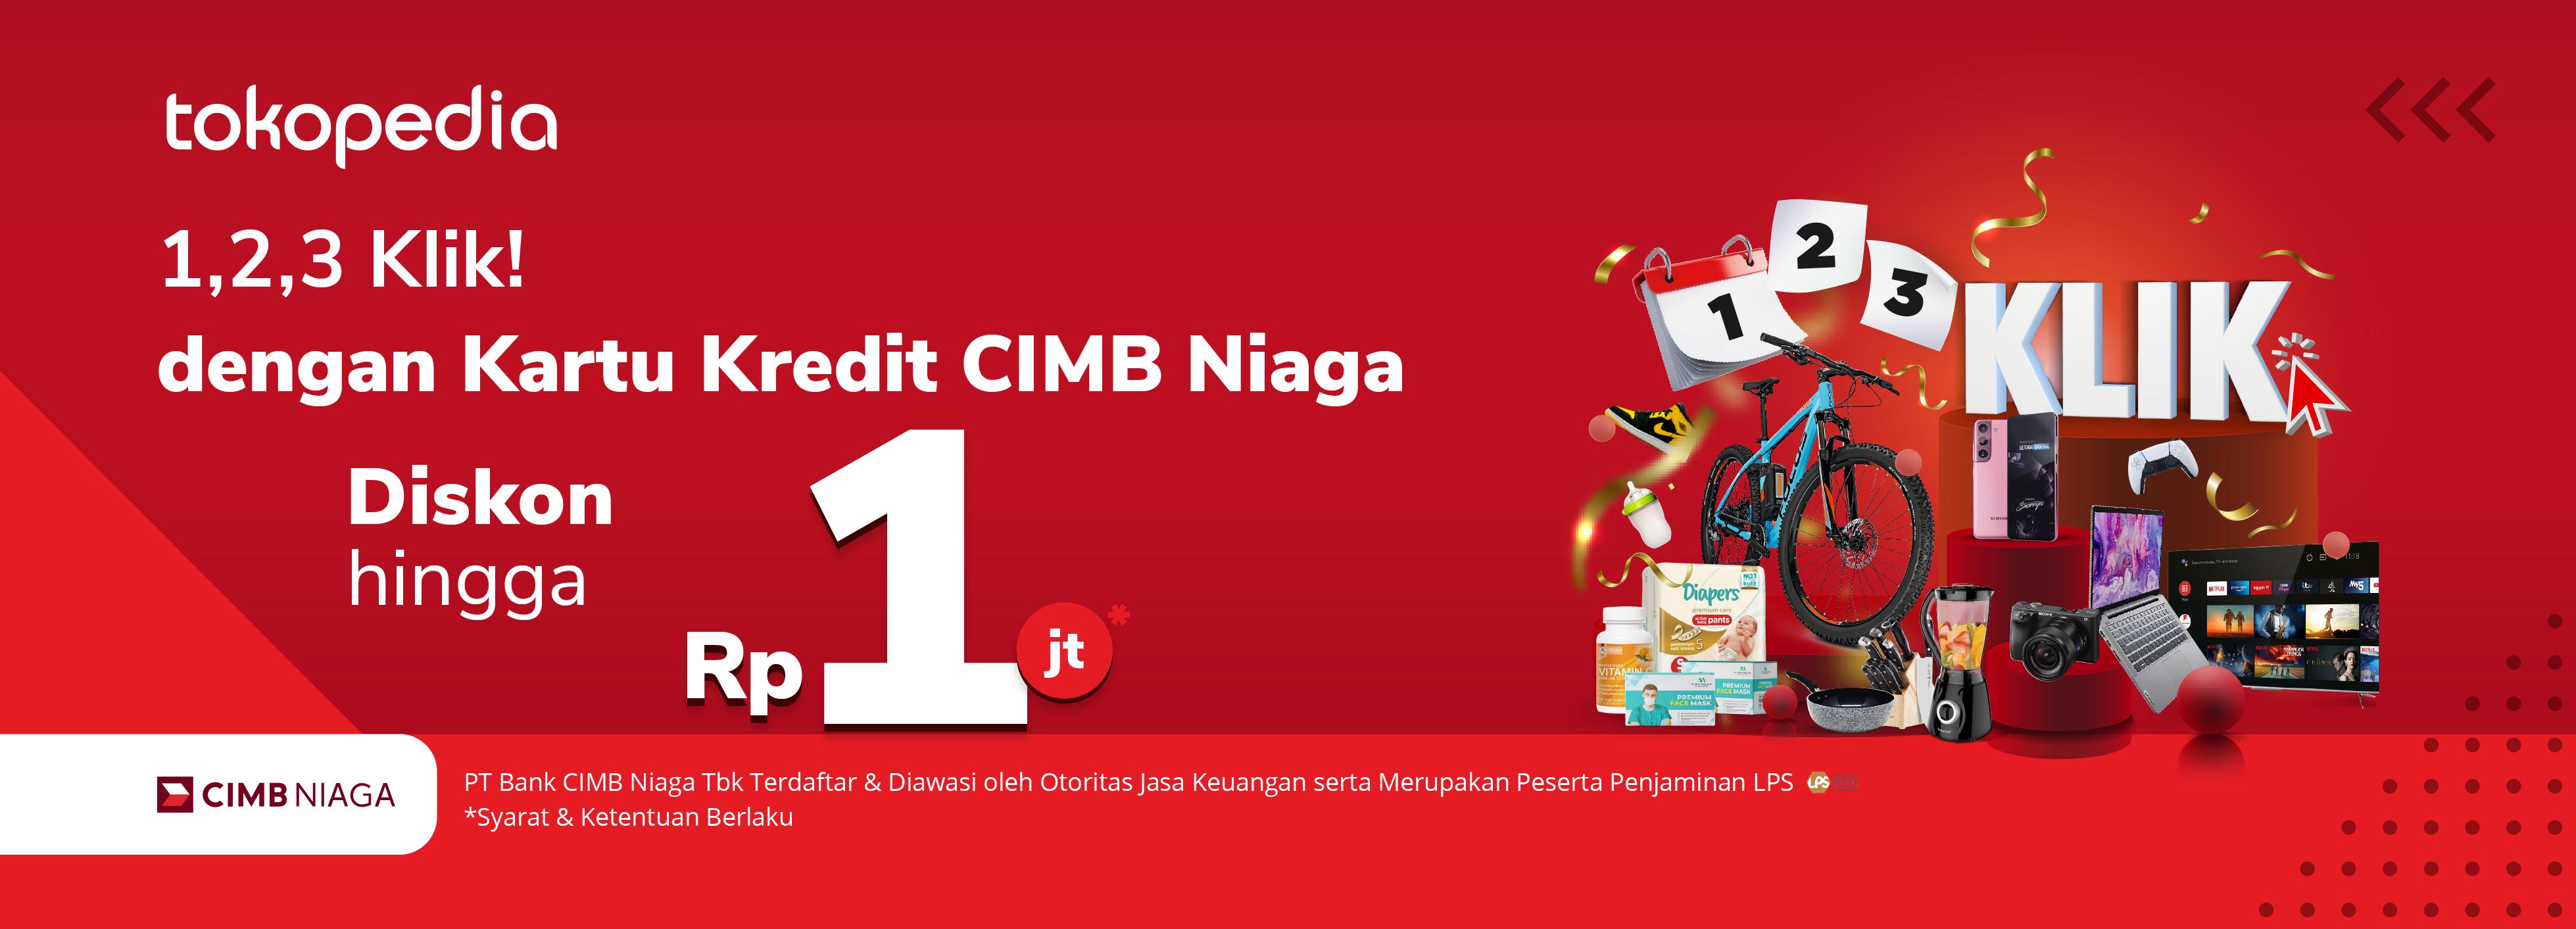 Hadiah Spesial Awal April dan Mei, Diskon hingga Rp 1.000.000,- Pakai Kartu Kredit CIMB Niaga!